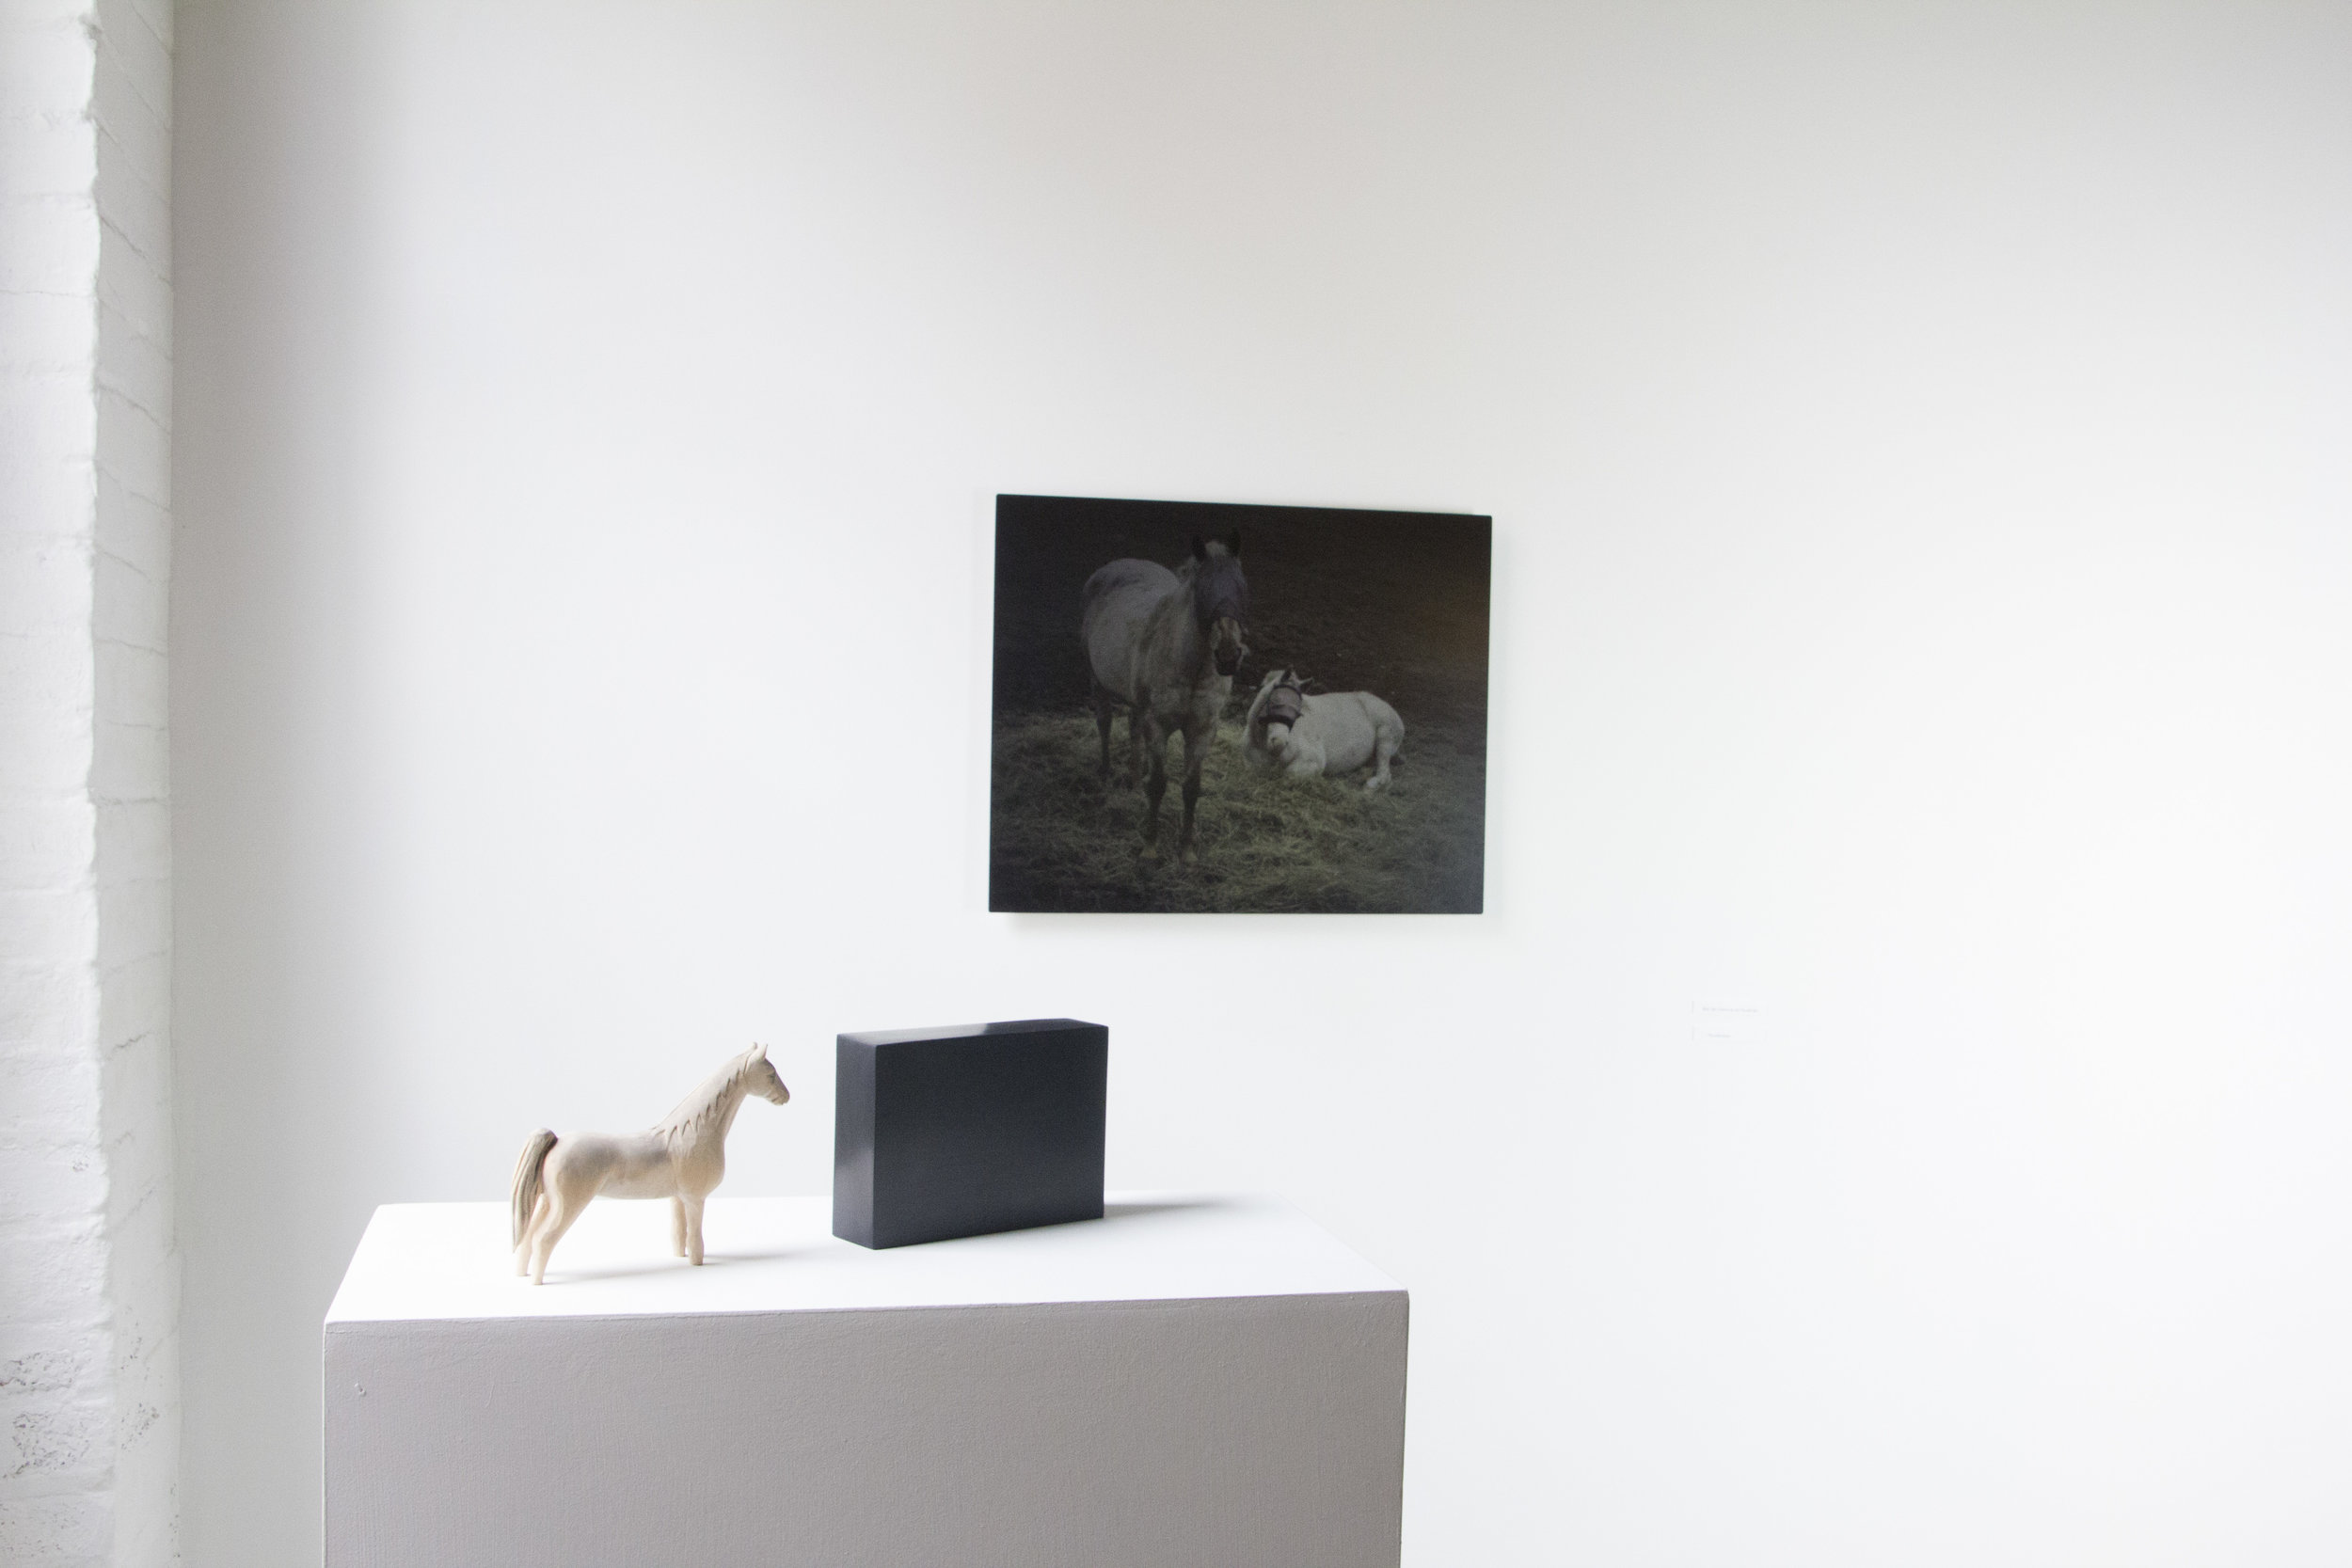 Helen_Hawley_google__art_lit_lab_Chele_Isaac_installation_horses.JPG